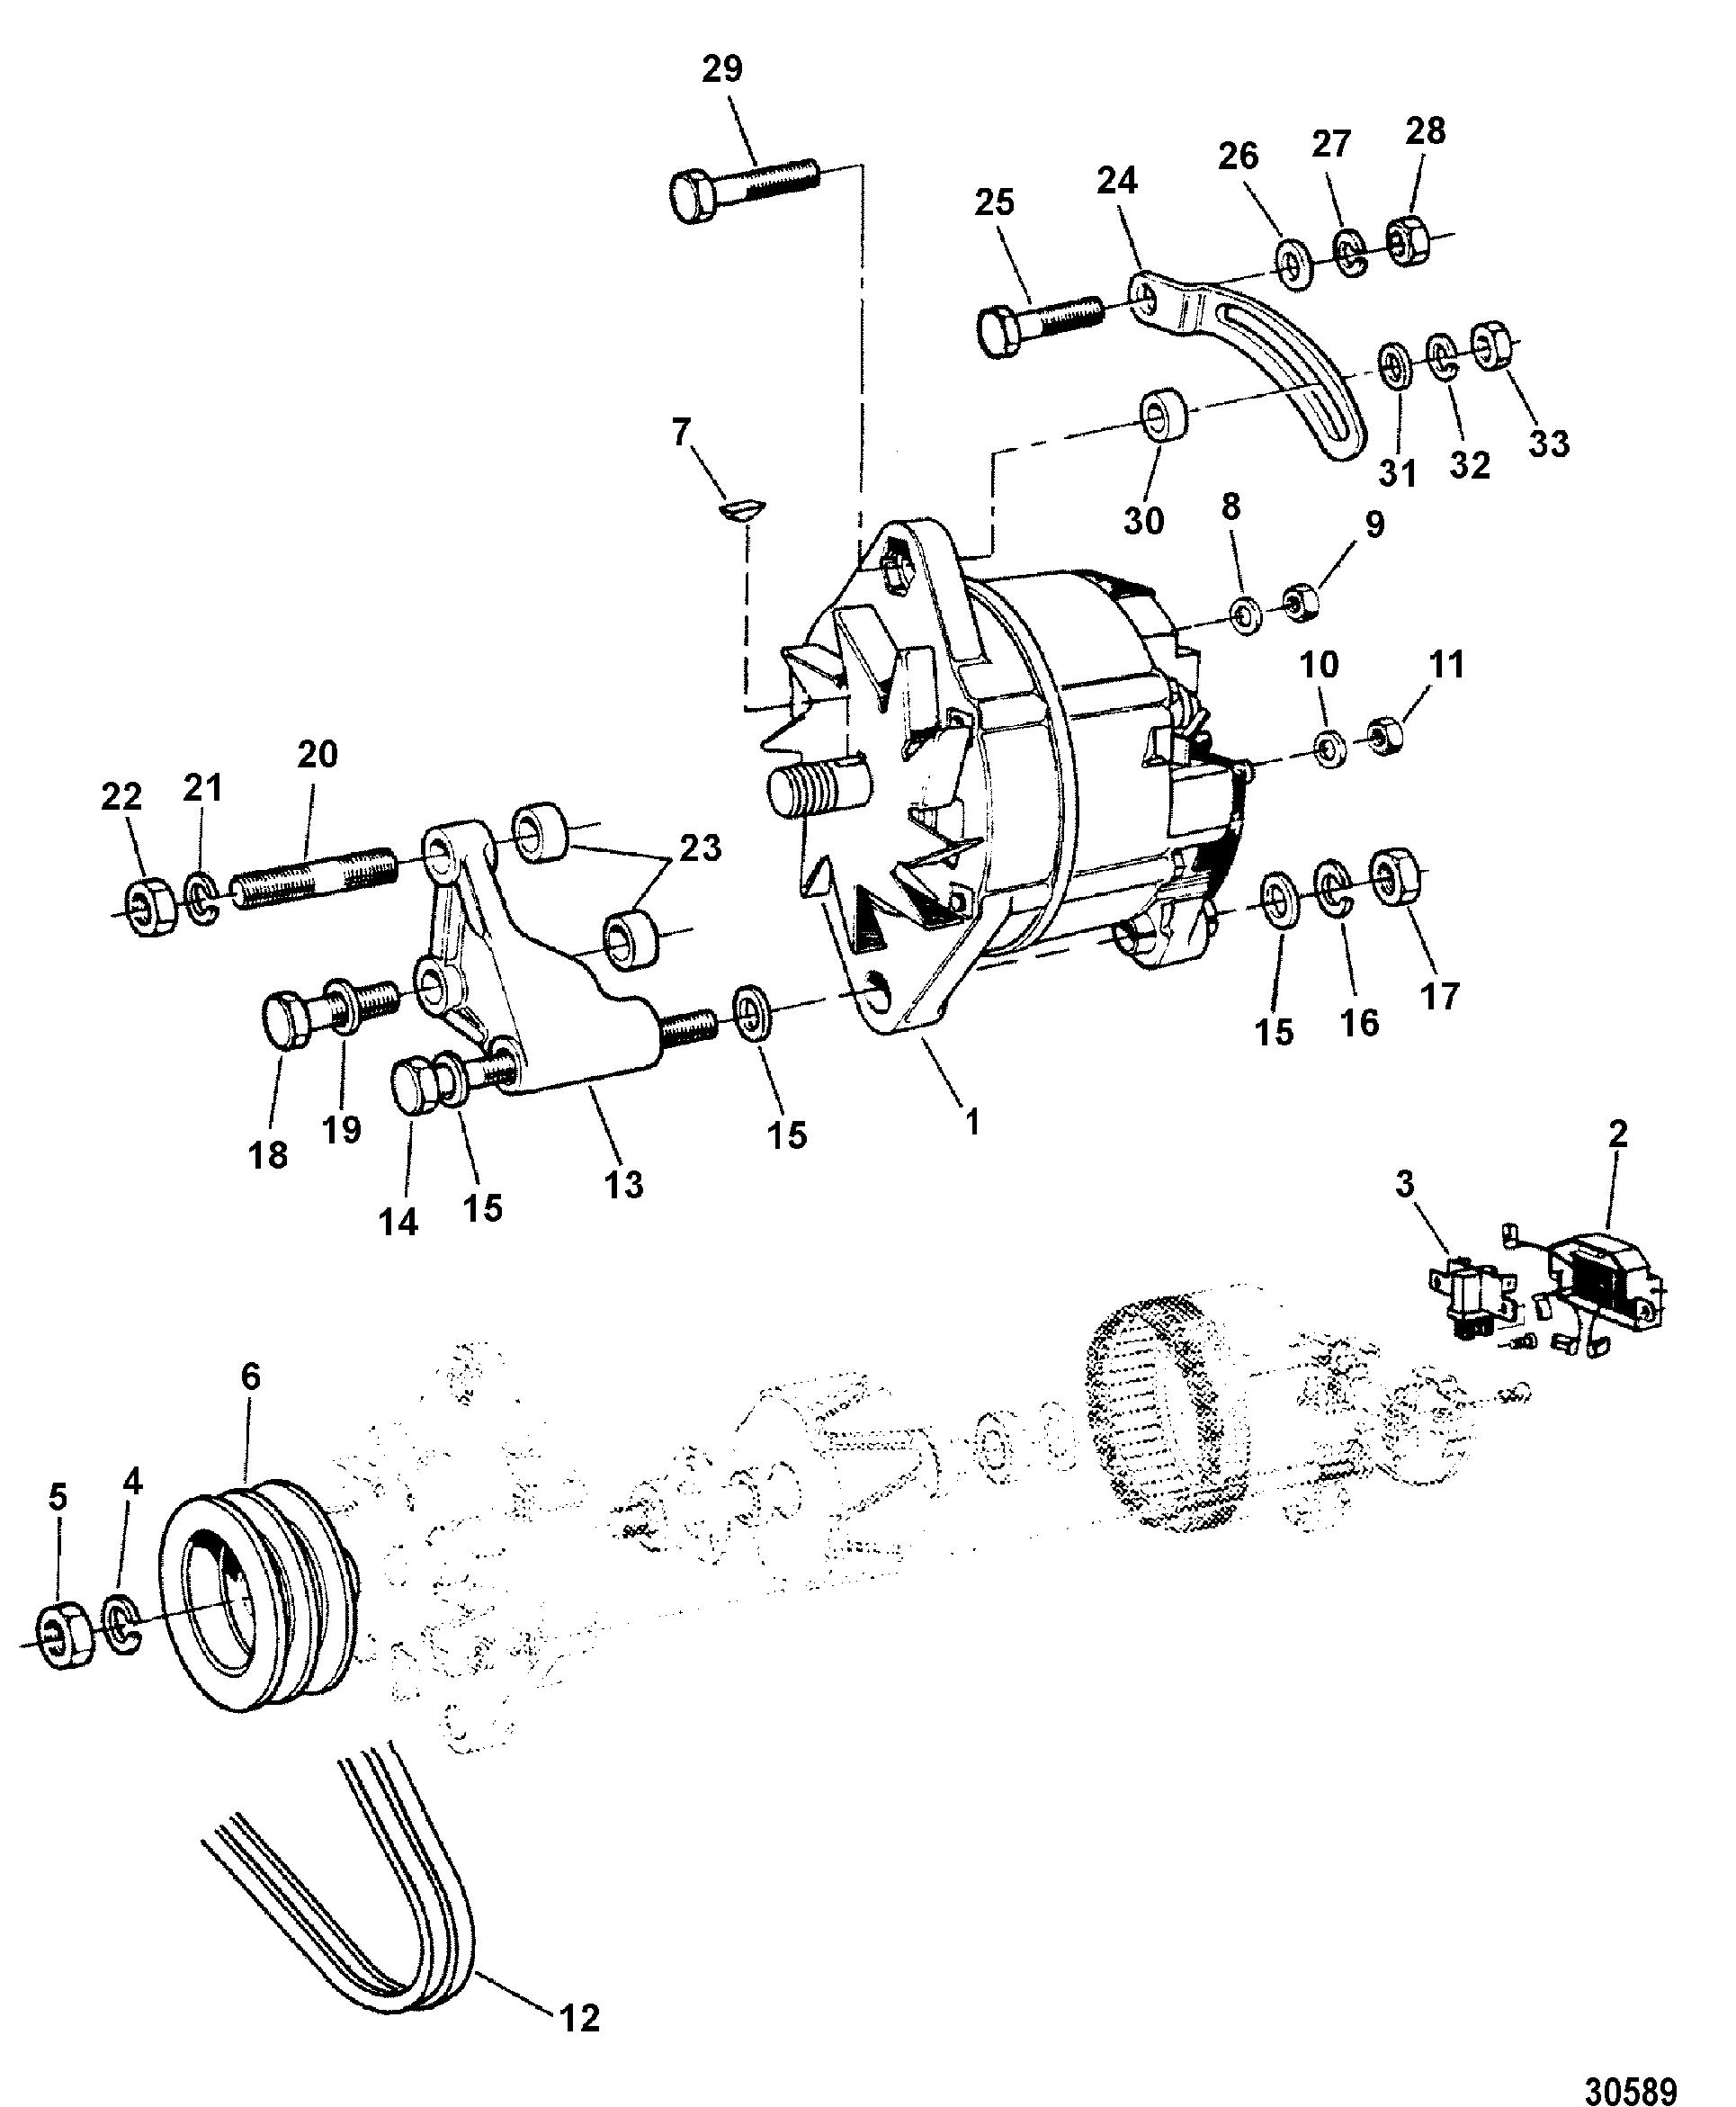 1963 mercury alternator wiring diagram database  mercruiser d4 2l 200 ld vm 254 i l6 1964 mercury marauder 1963 mercury alternator